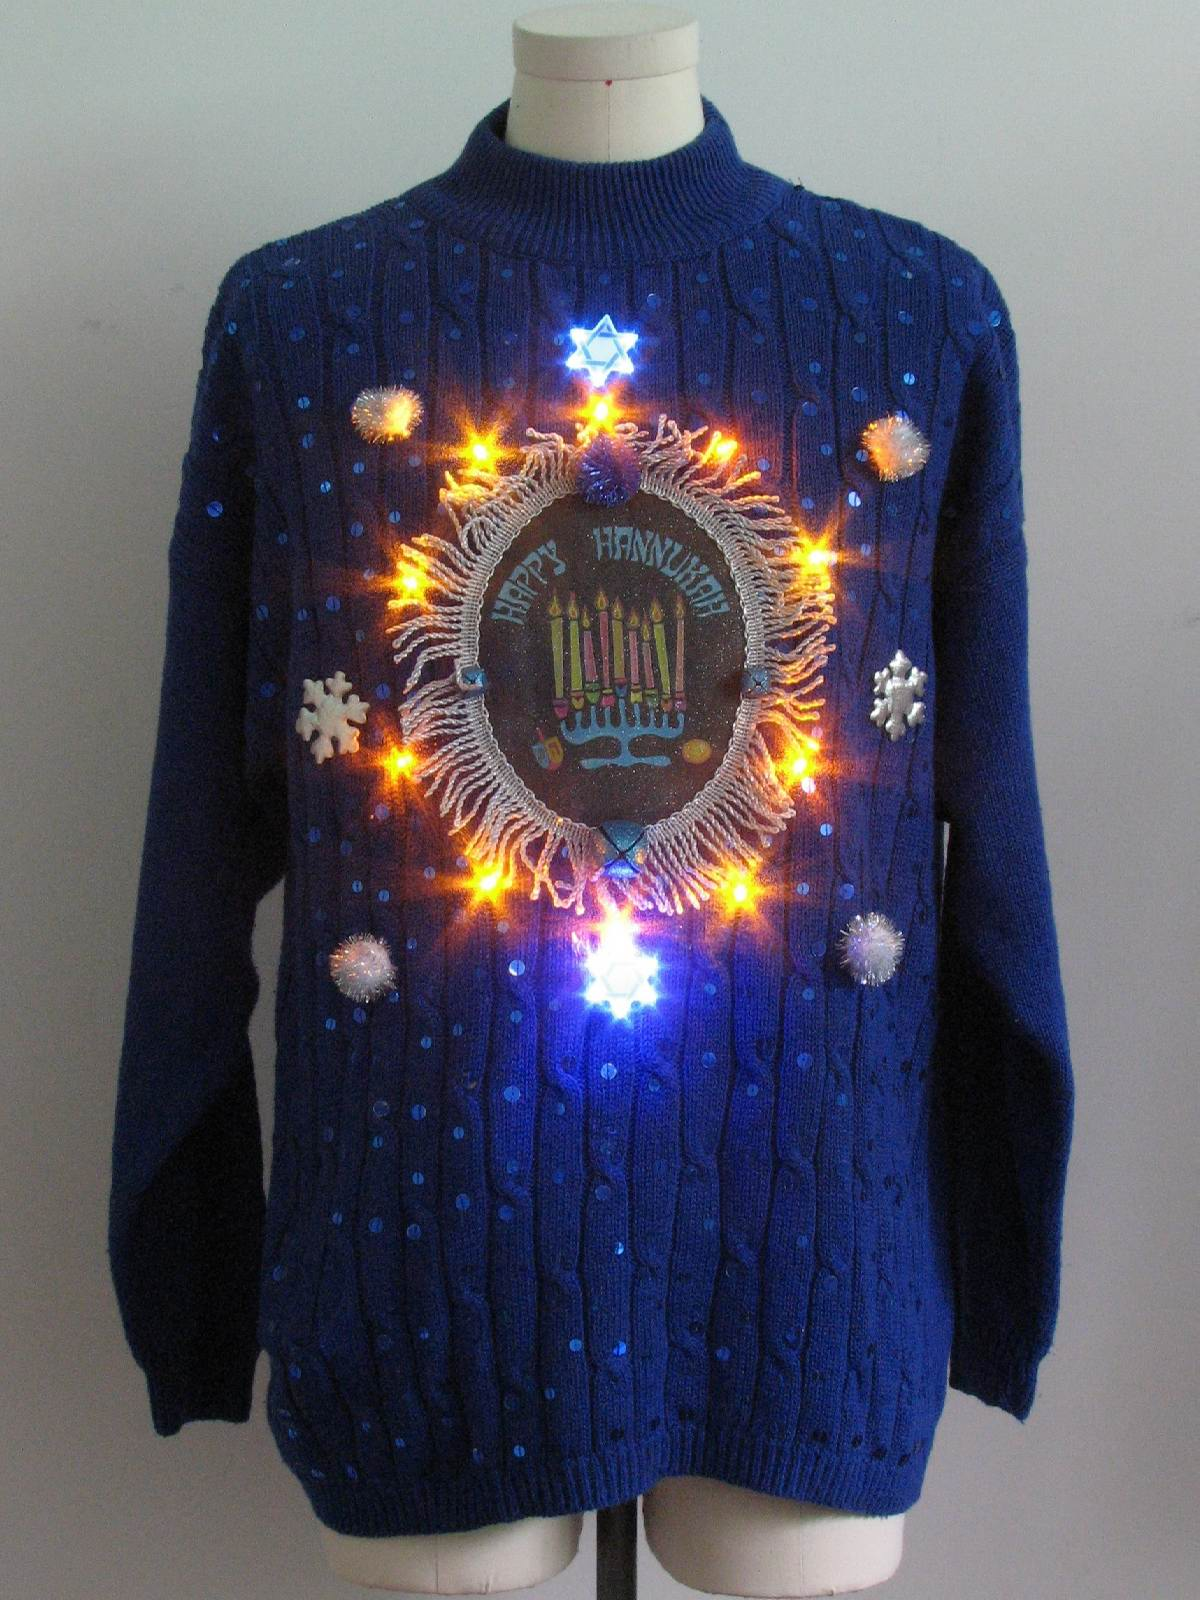 Amber Lightup Hanukkah Ugly Christmas Sweater